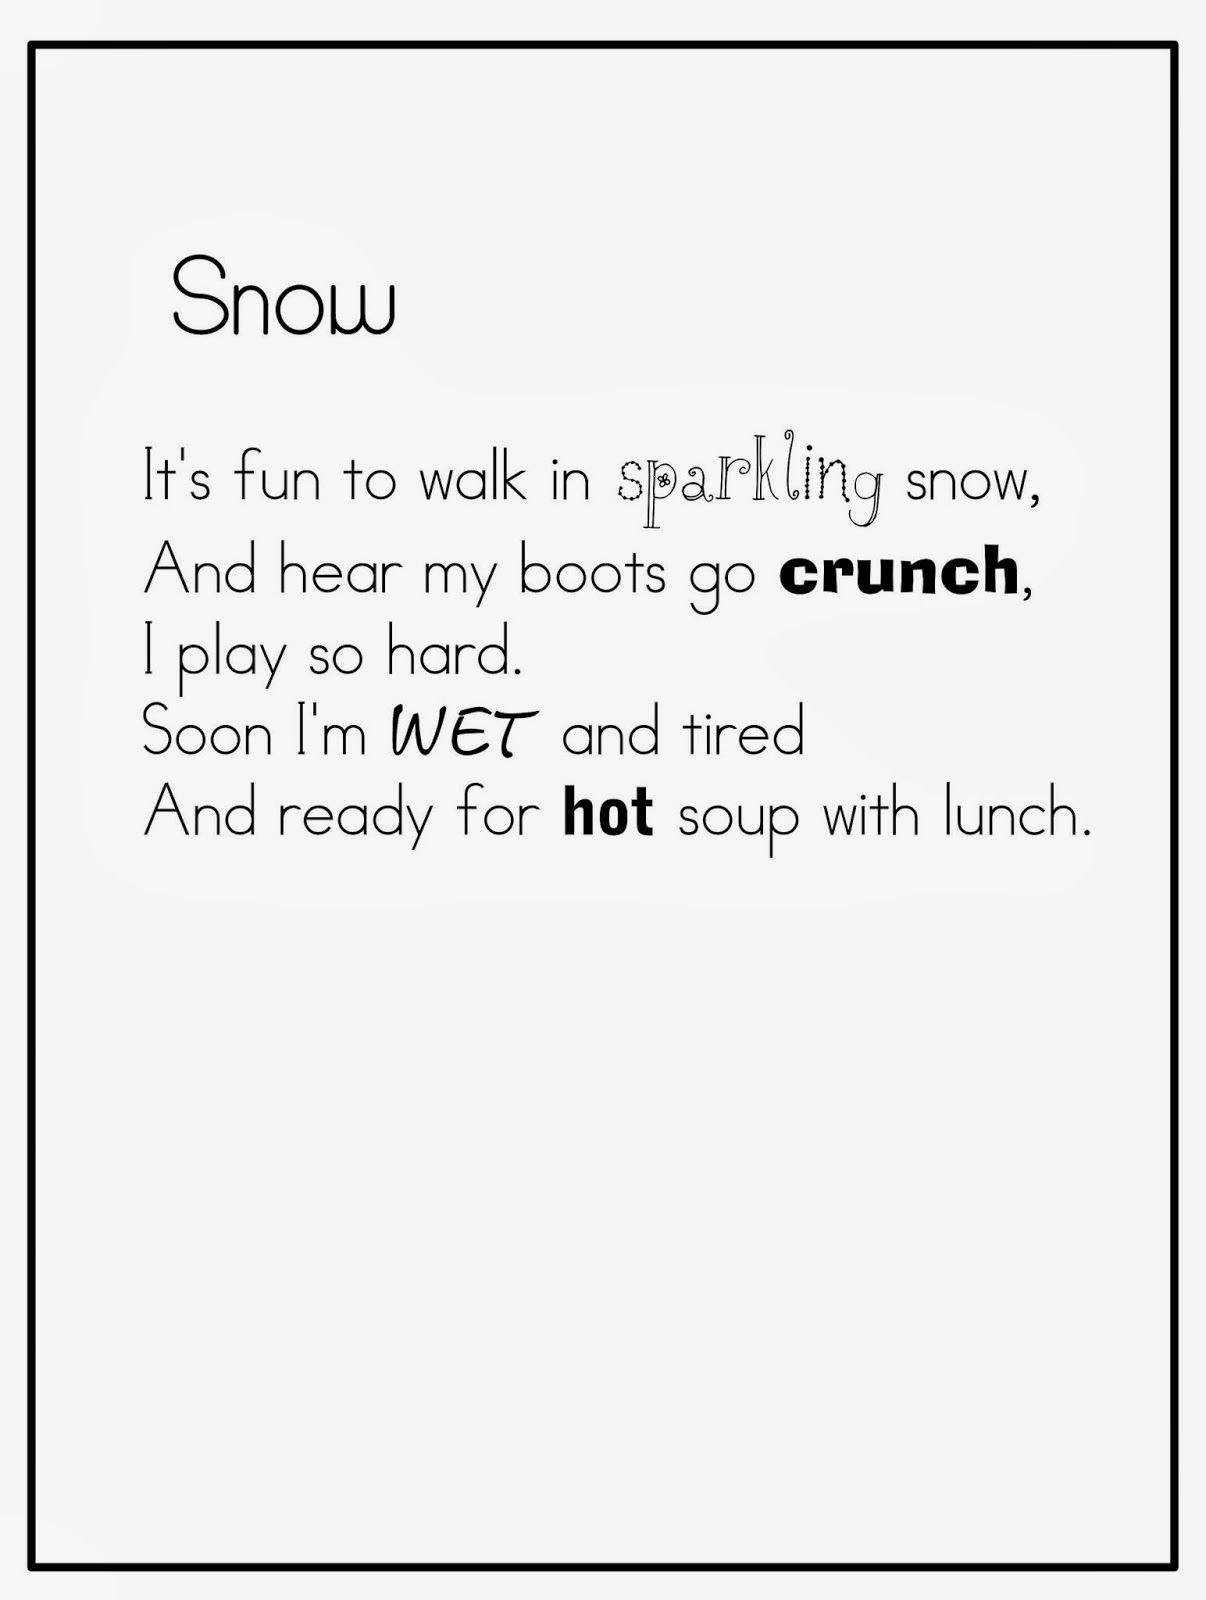 Joyful Learning In Kc {Short Winter Poems} | School- Winter  Short Poem O Calender Images